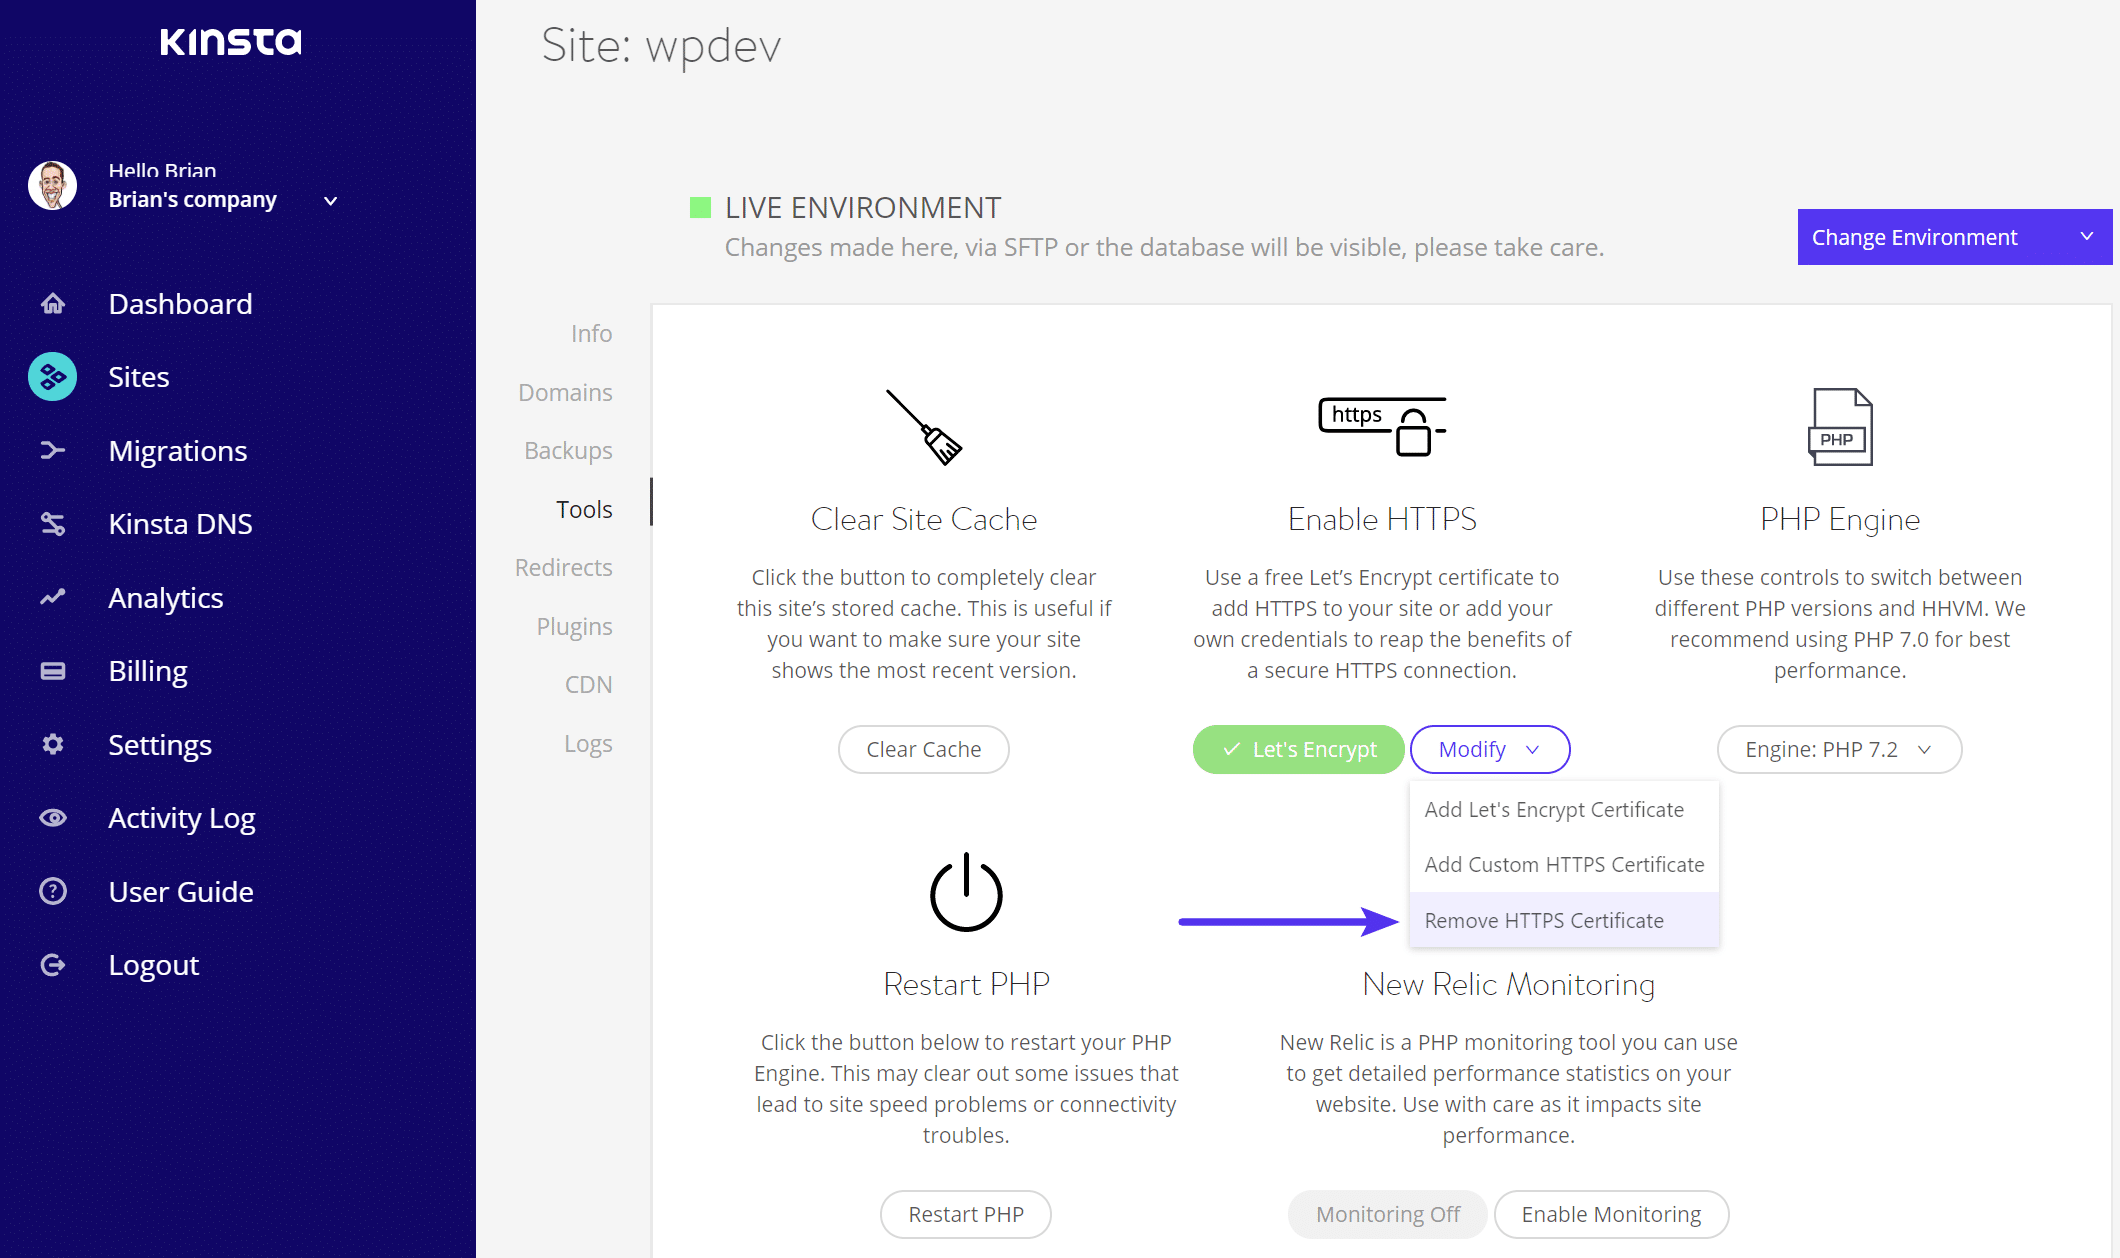 Supprimer le certificat HTTPS